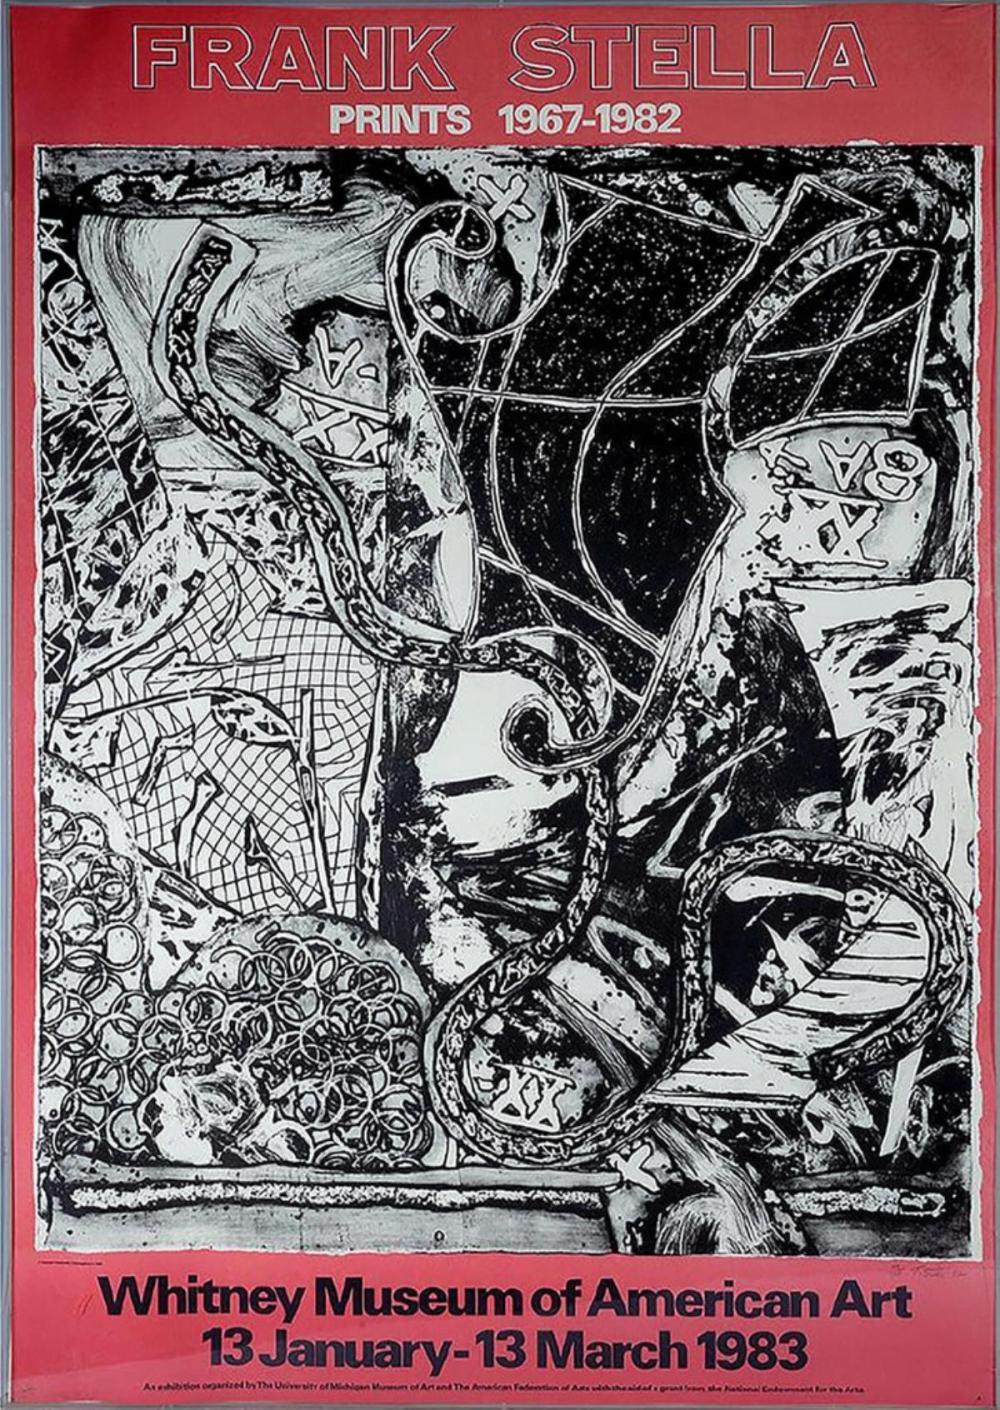 Frank Stella - Whitney Museum of American Art: Prints